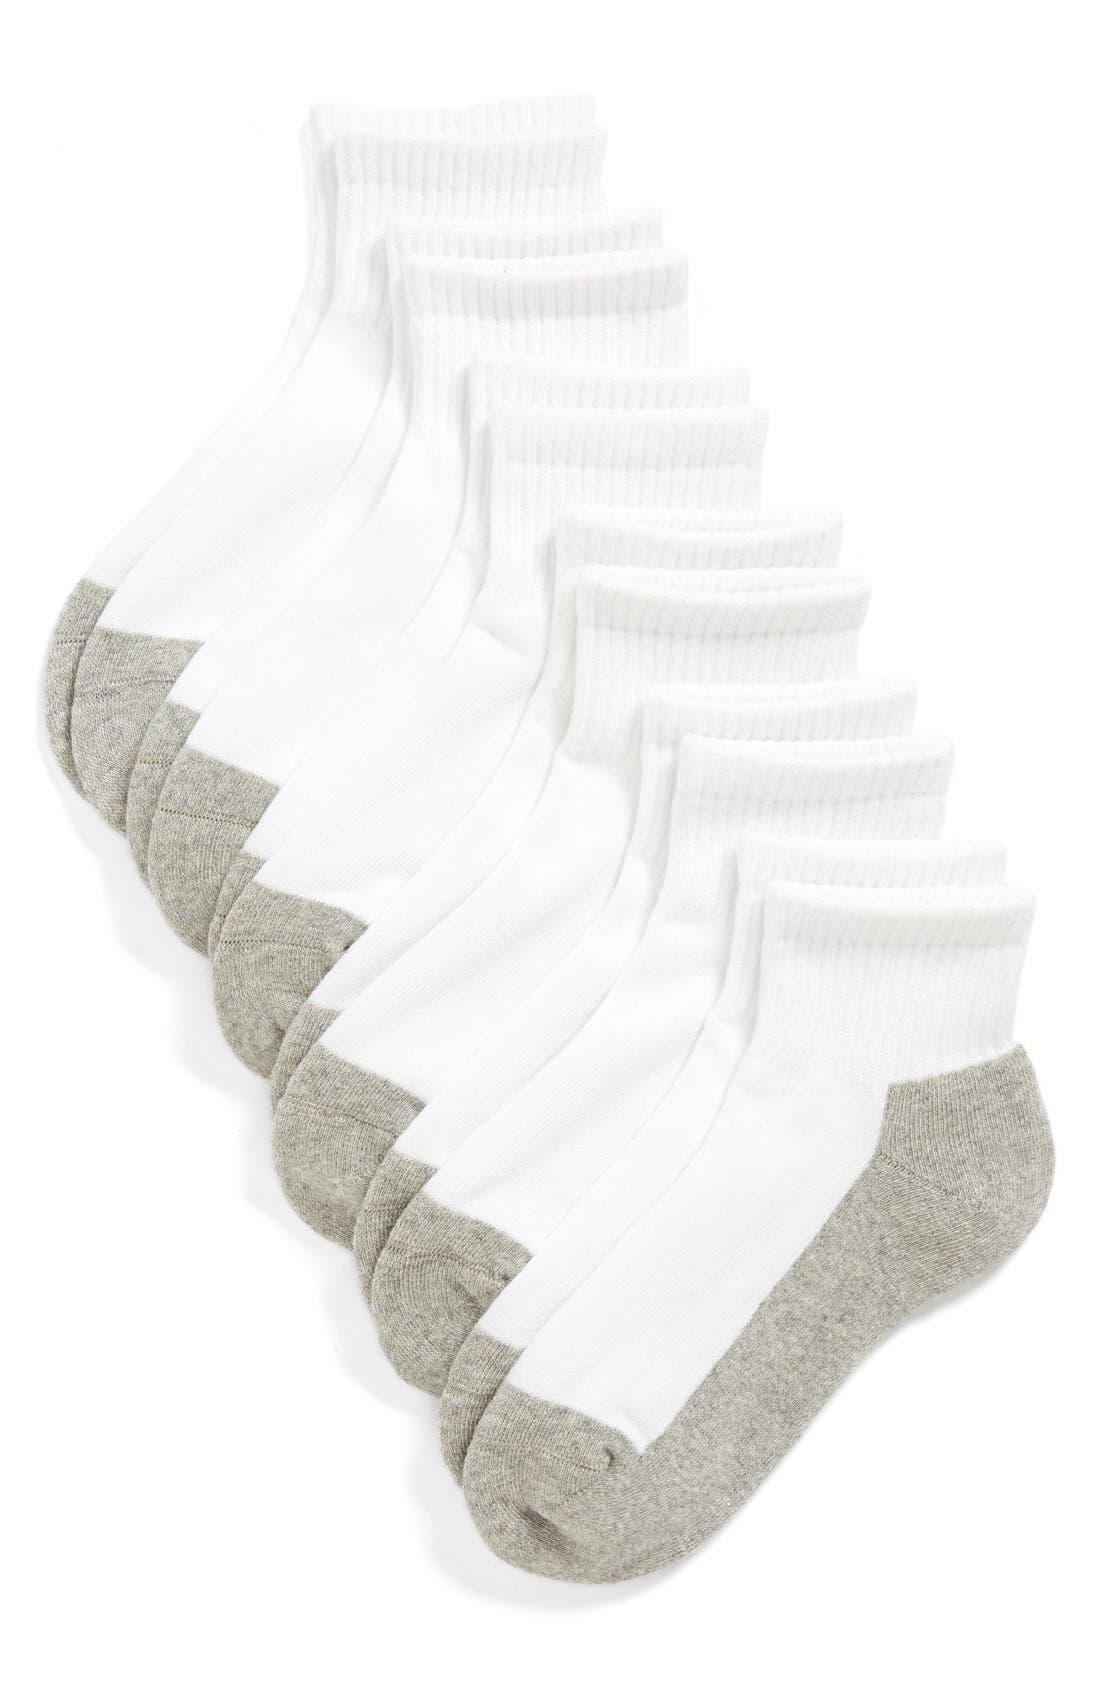 6-Pack Active Quarter Socks,                         Main,                         color, WHITE/ GREY